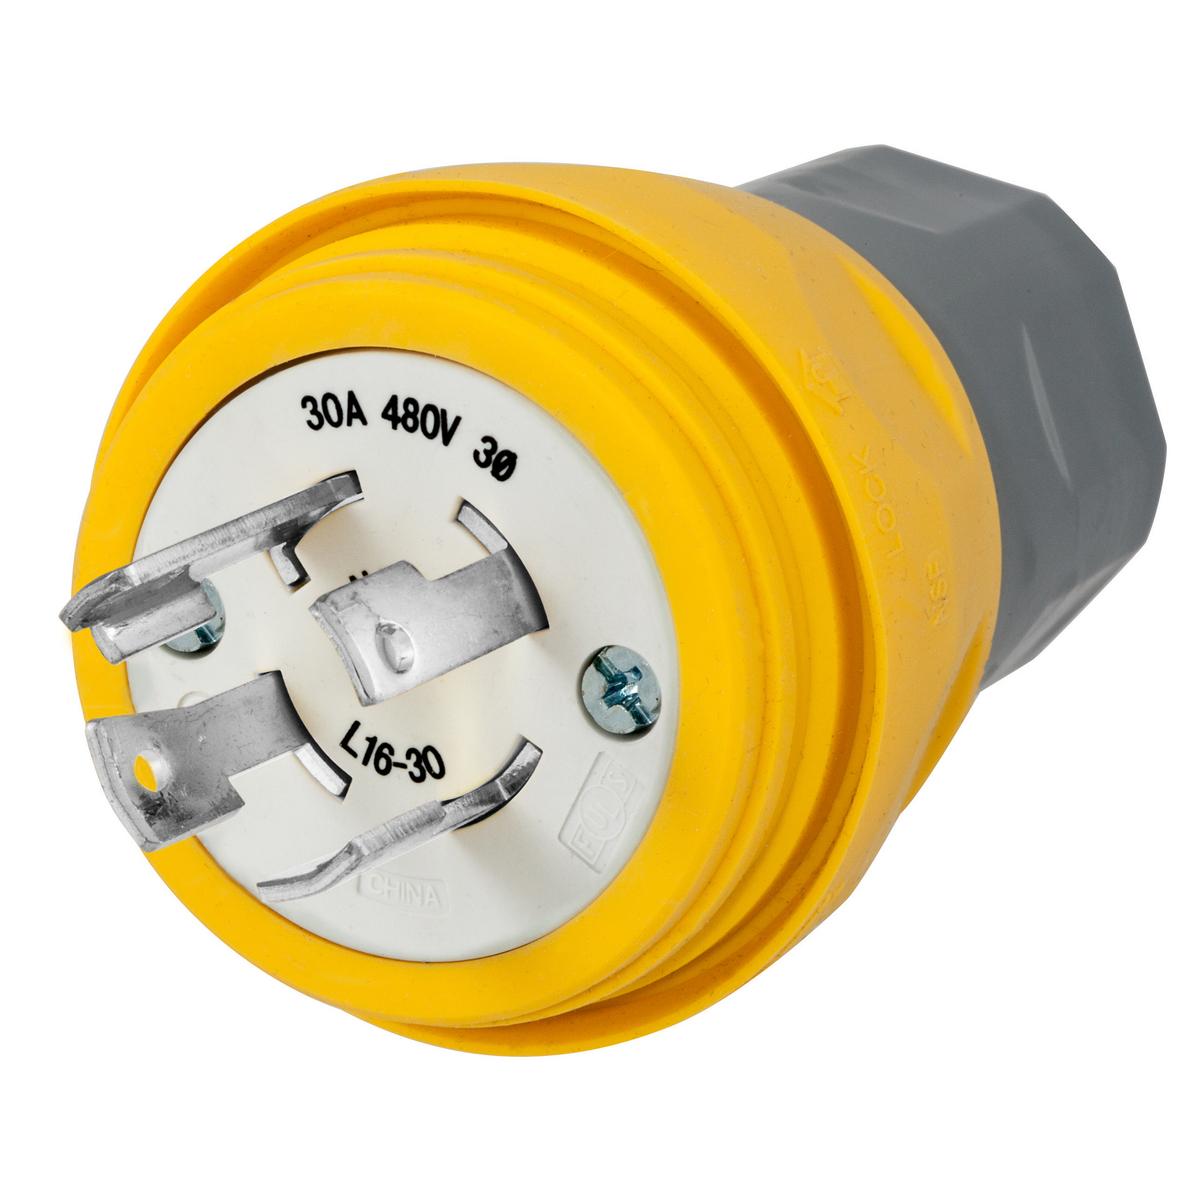 hight resolution of wiring device kellems twist lock locking plug 3 phase grounding male